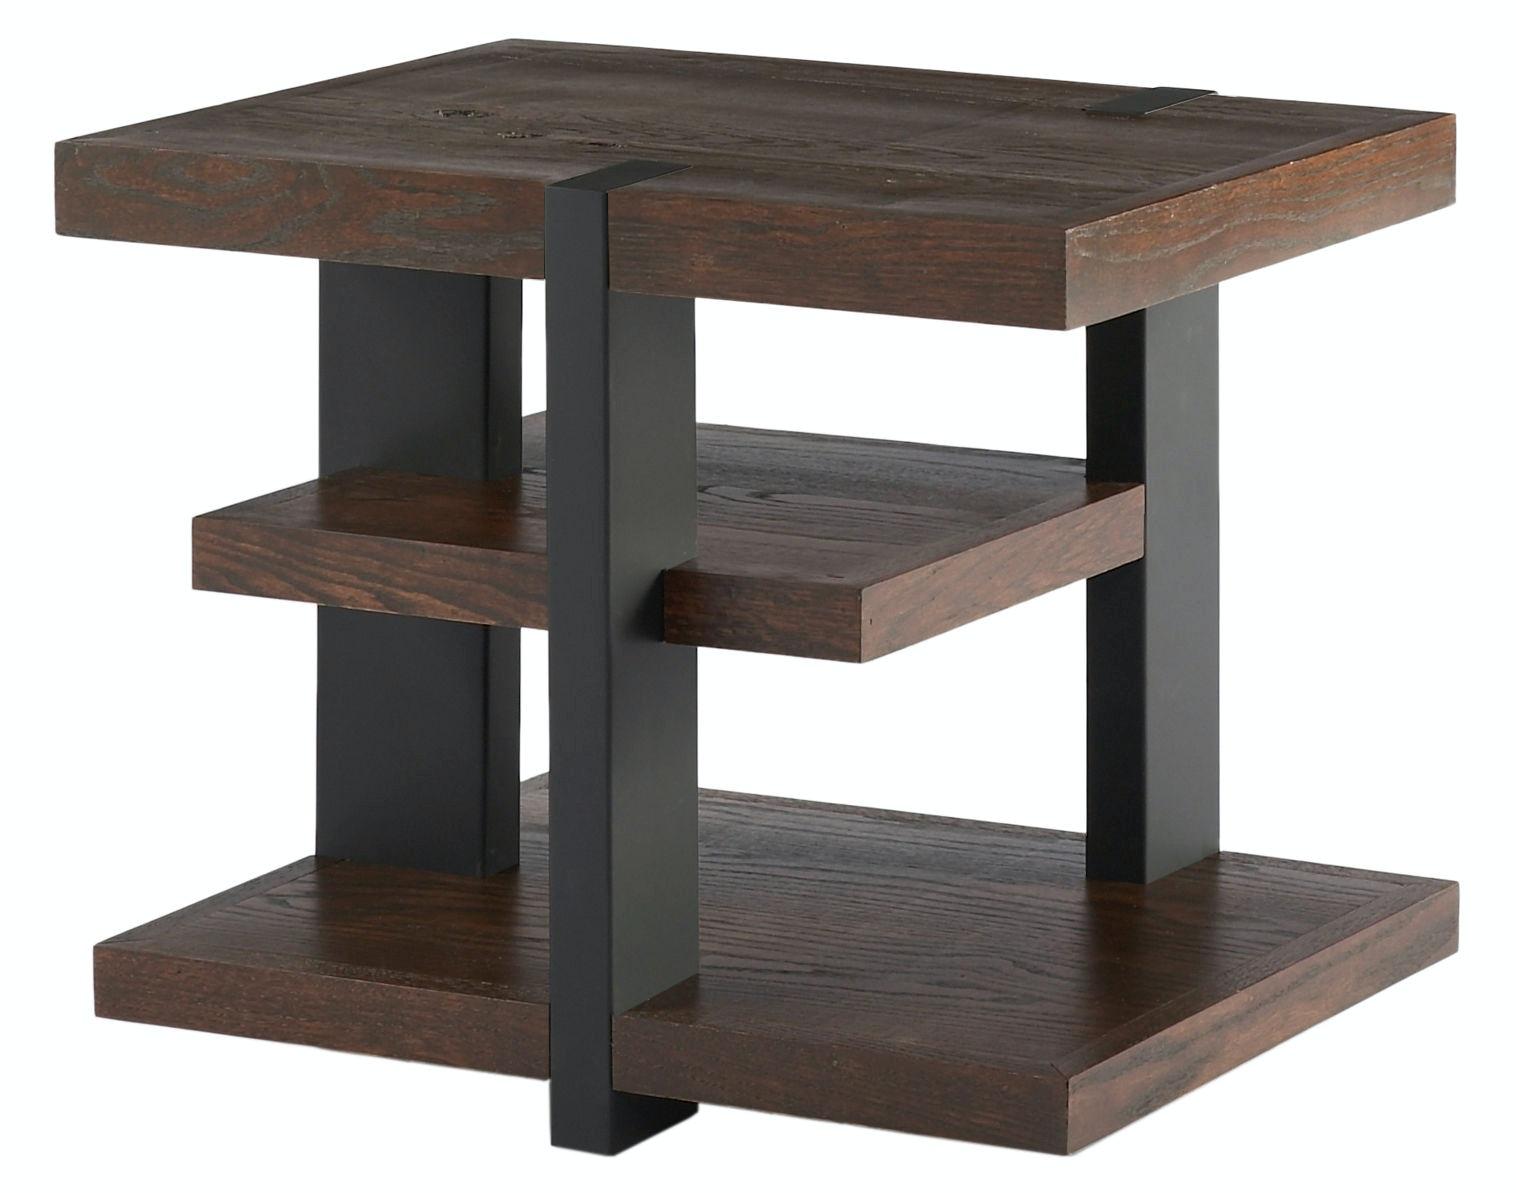 IZ1155 152. 1155 3 Shelf End Table